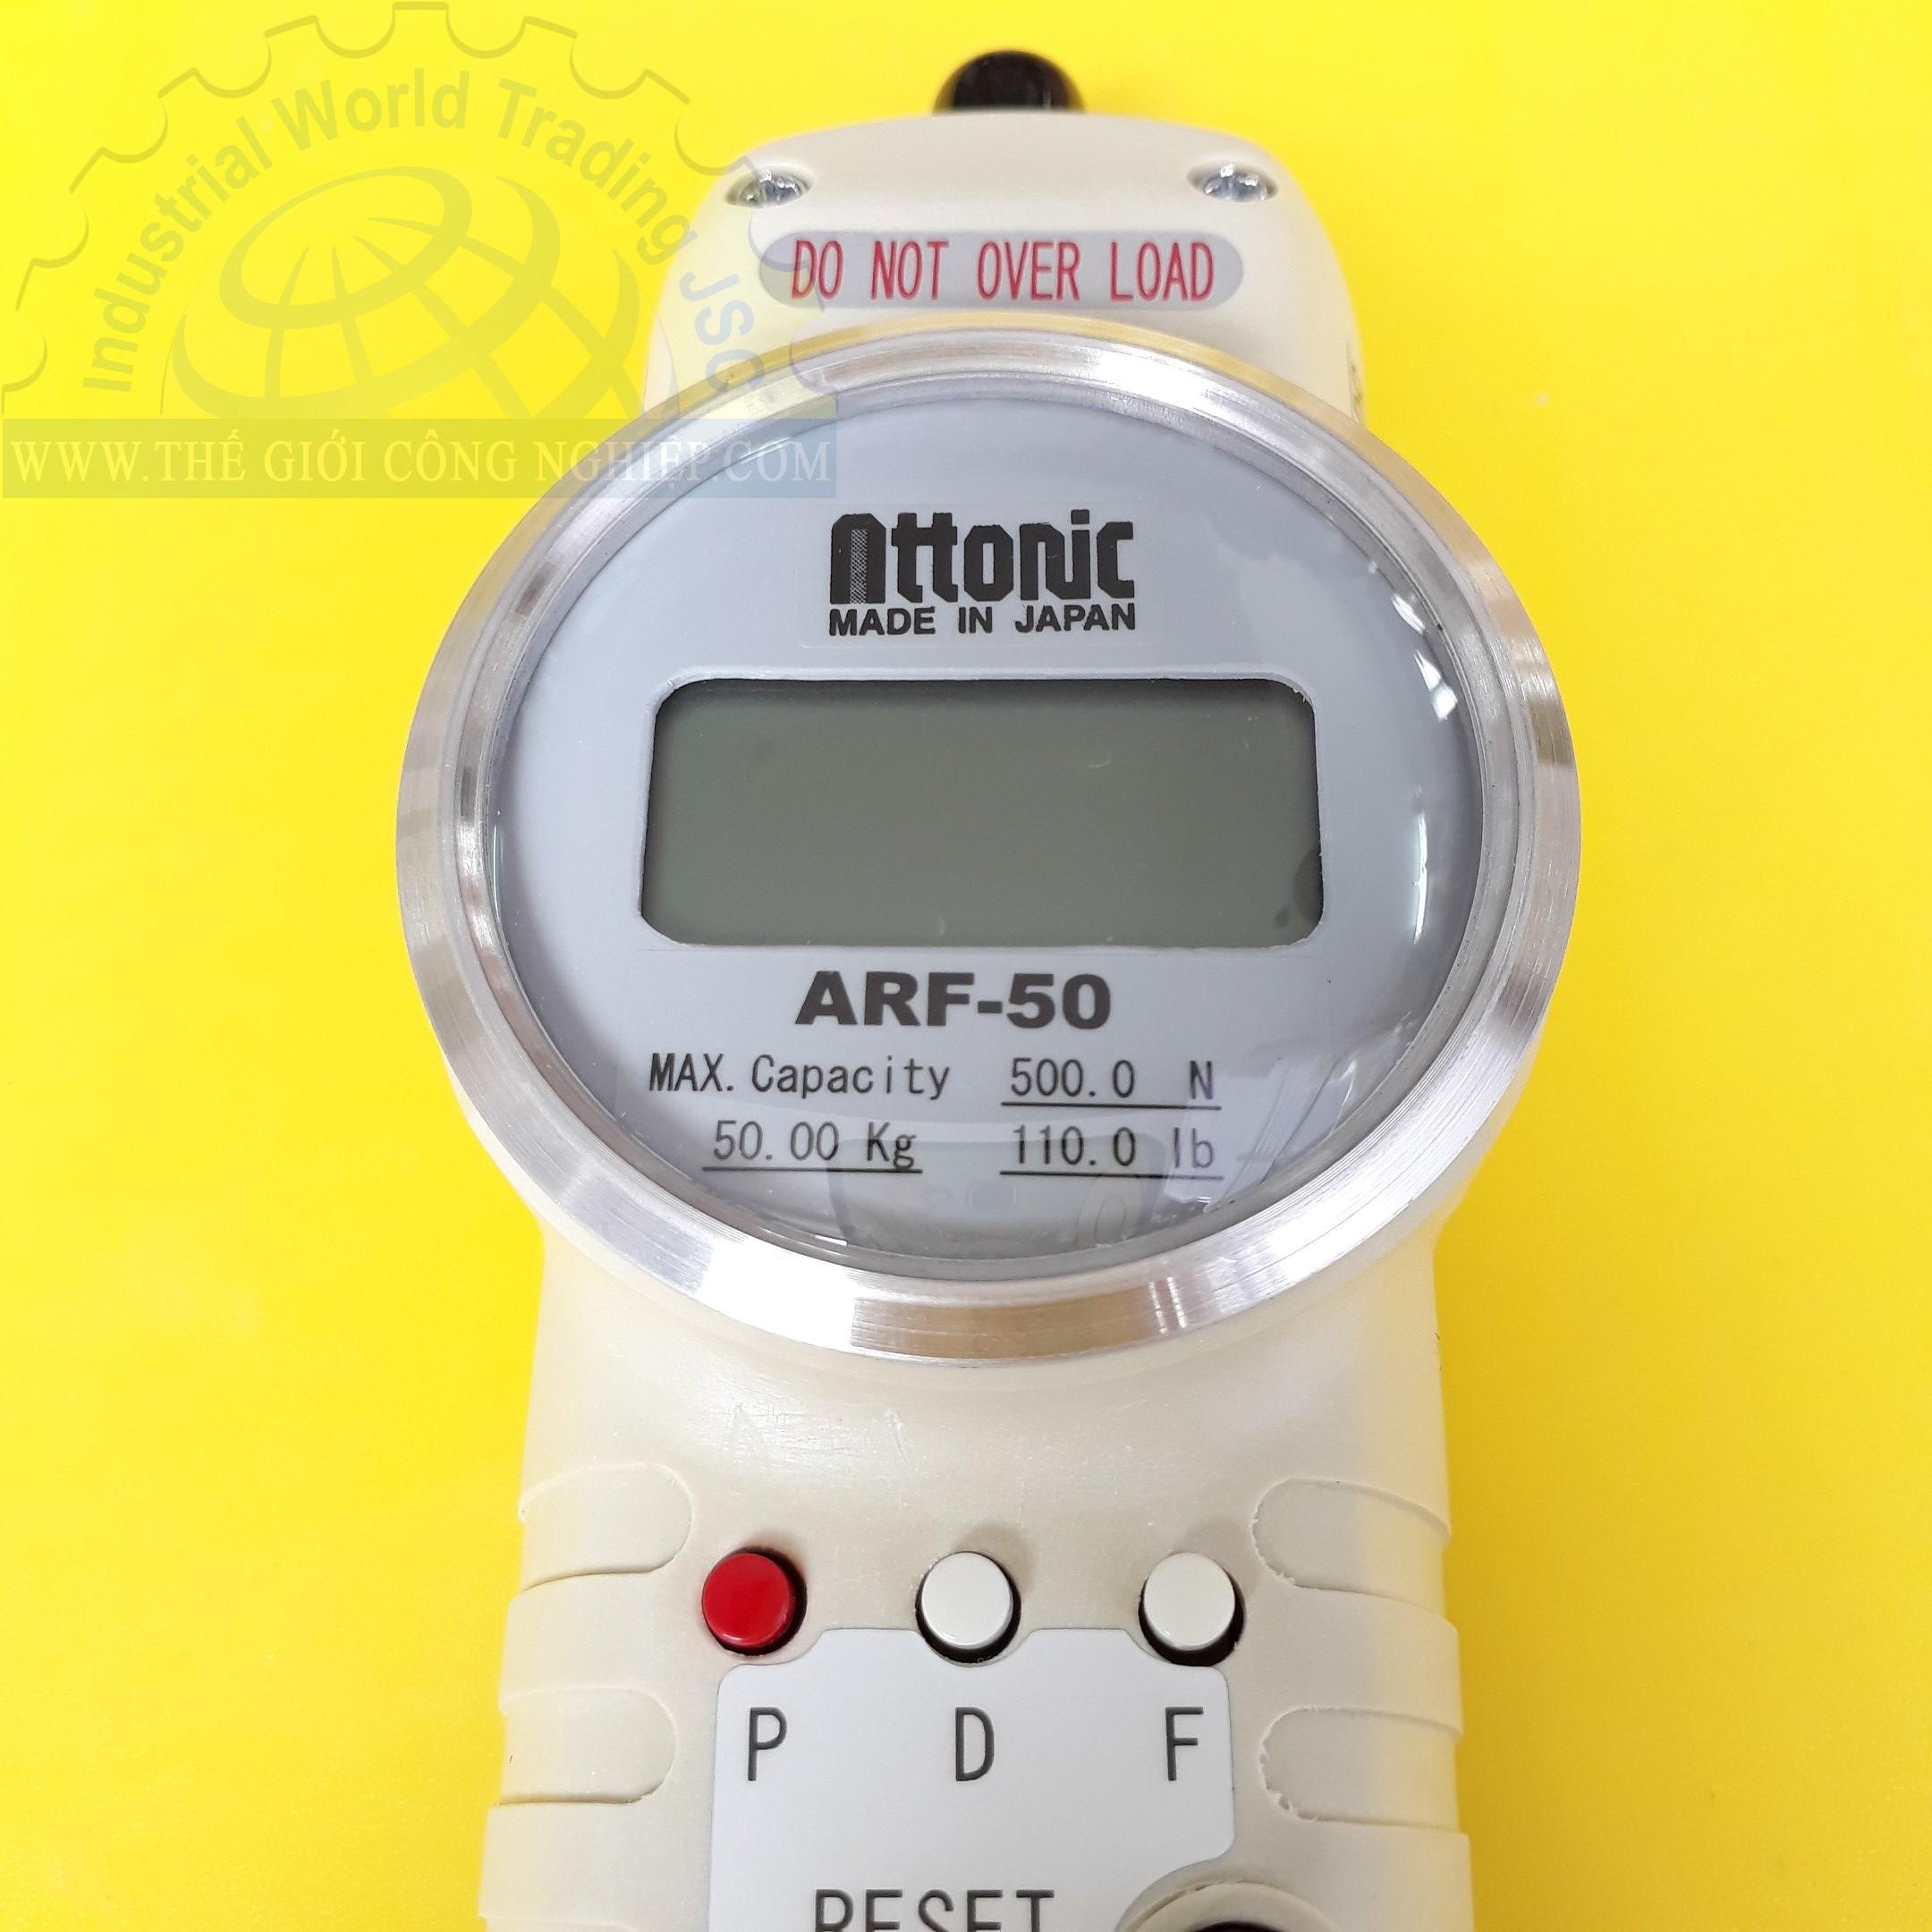 Digital force gauge ARF-50 ATTONIC